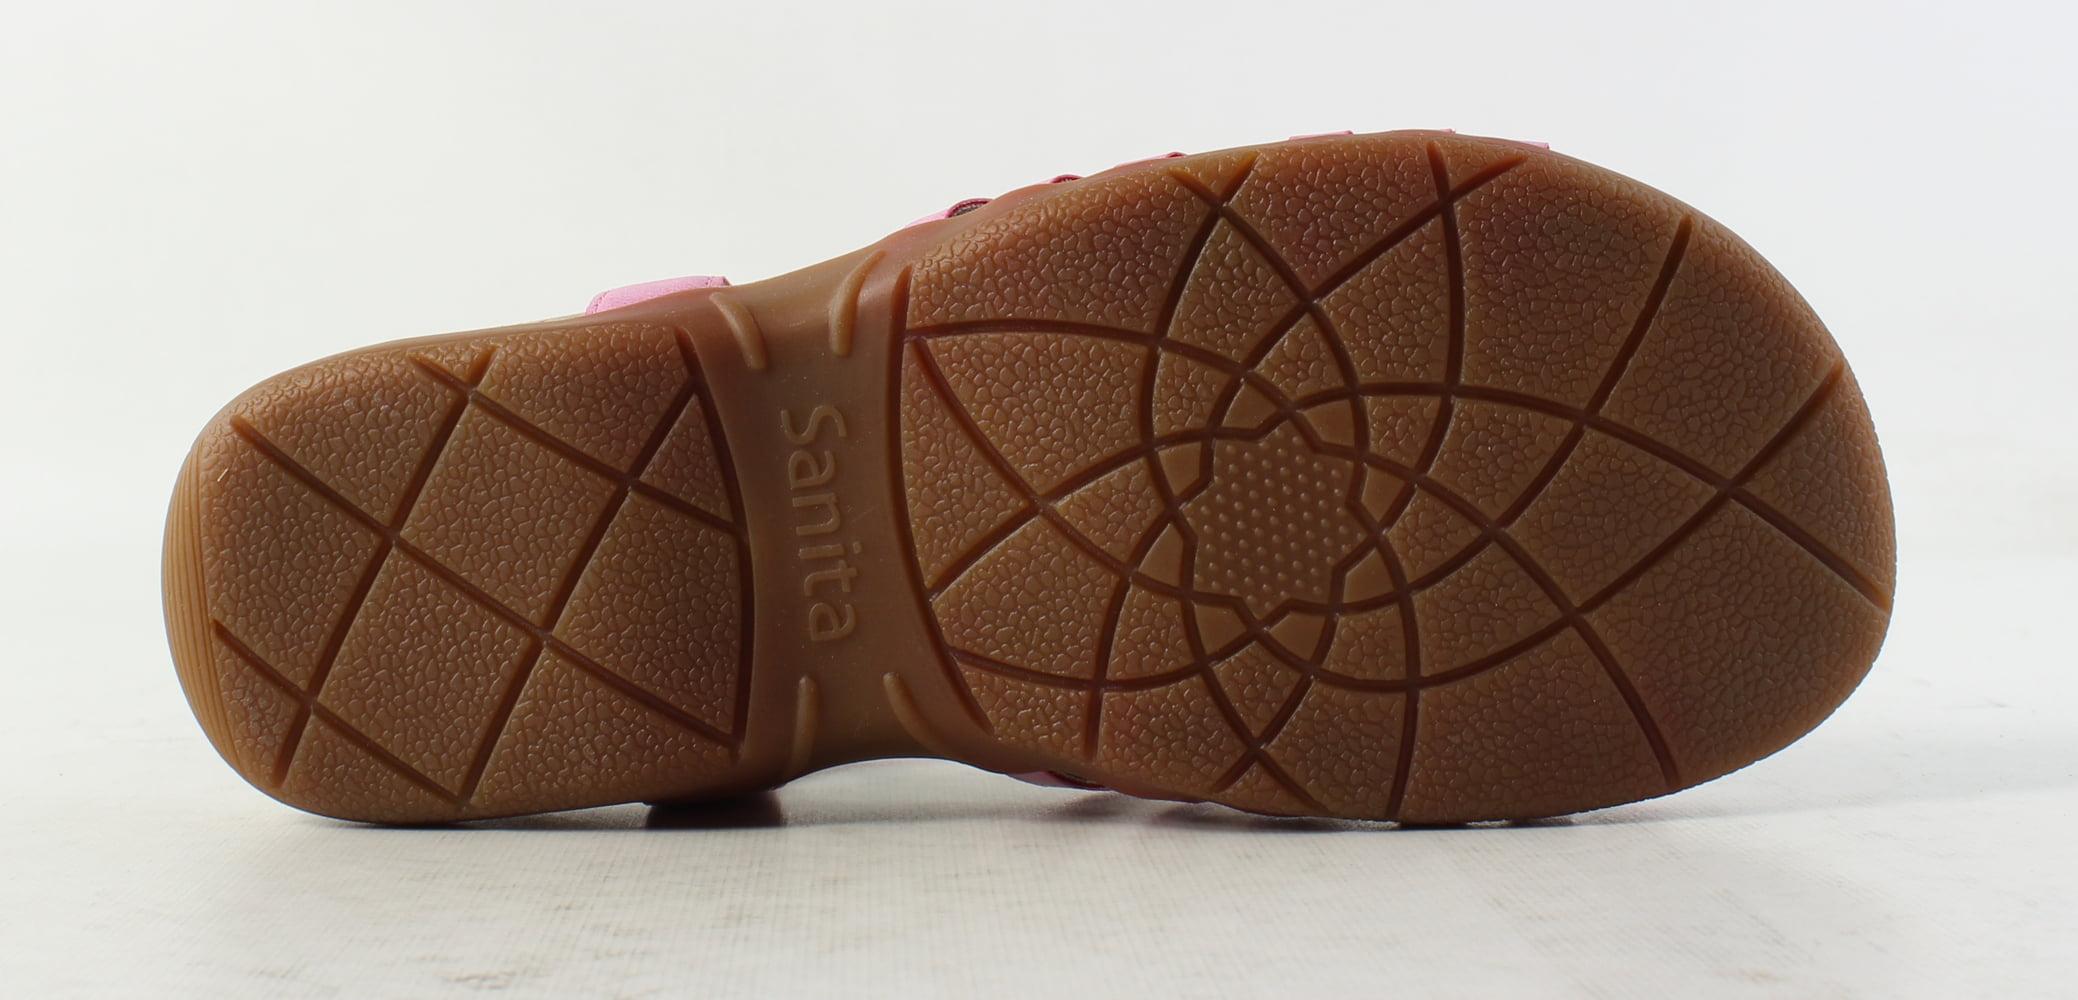 New Sanita Womens 463308 PastelPink Sandals Size 6